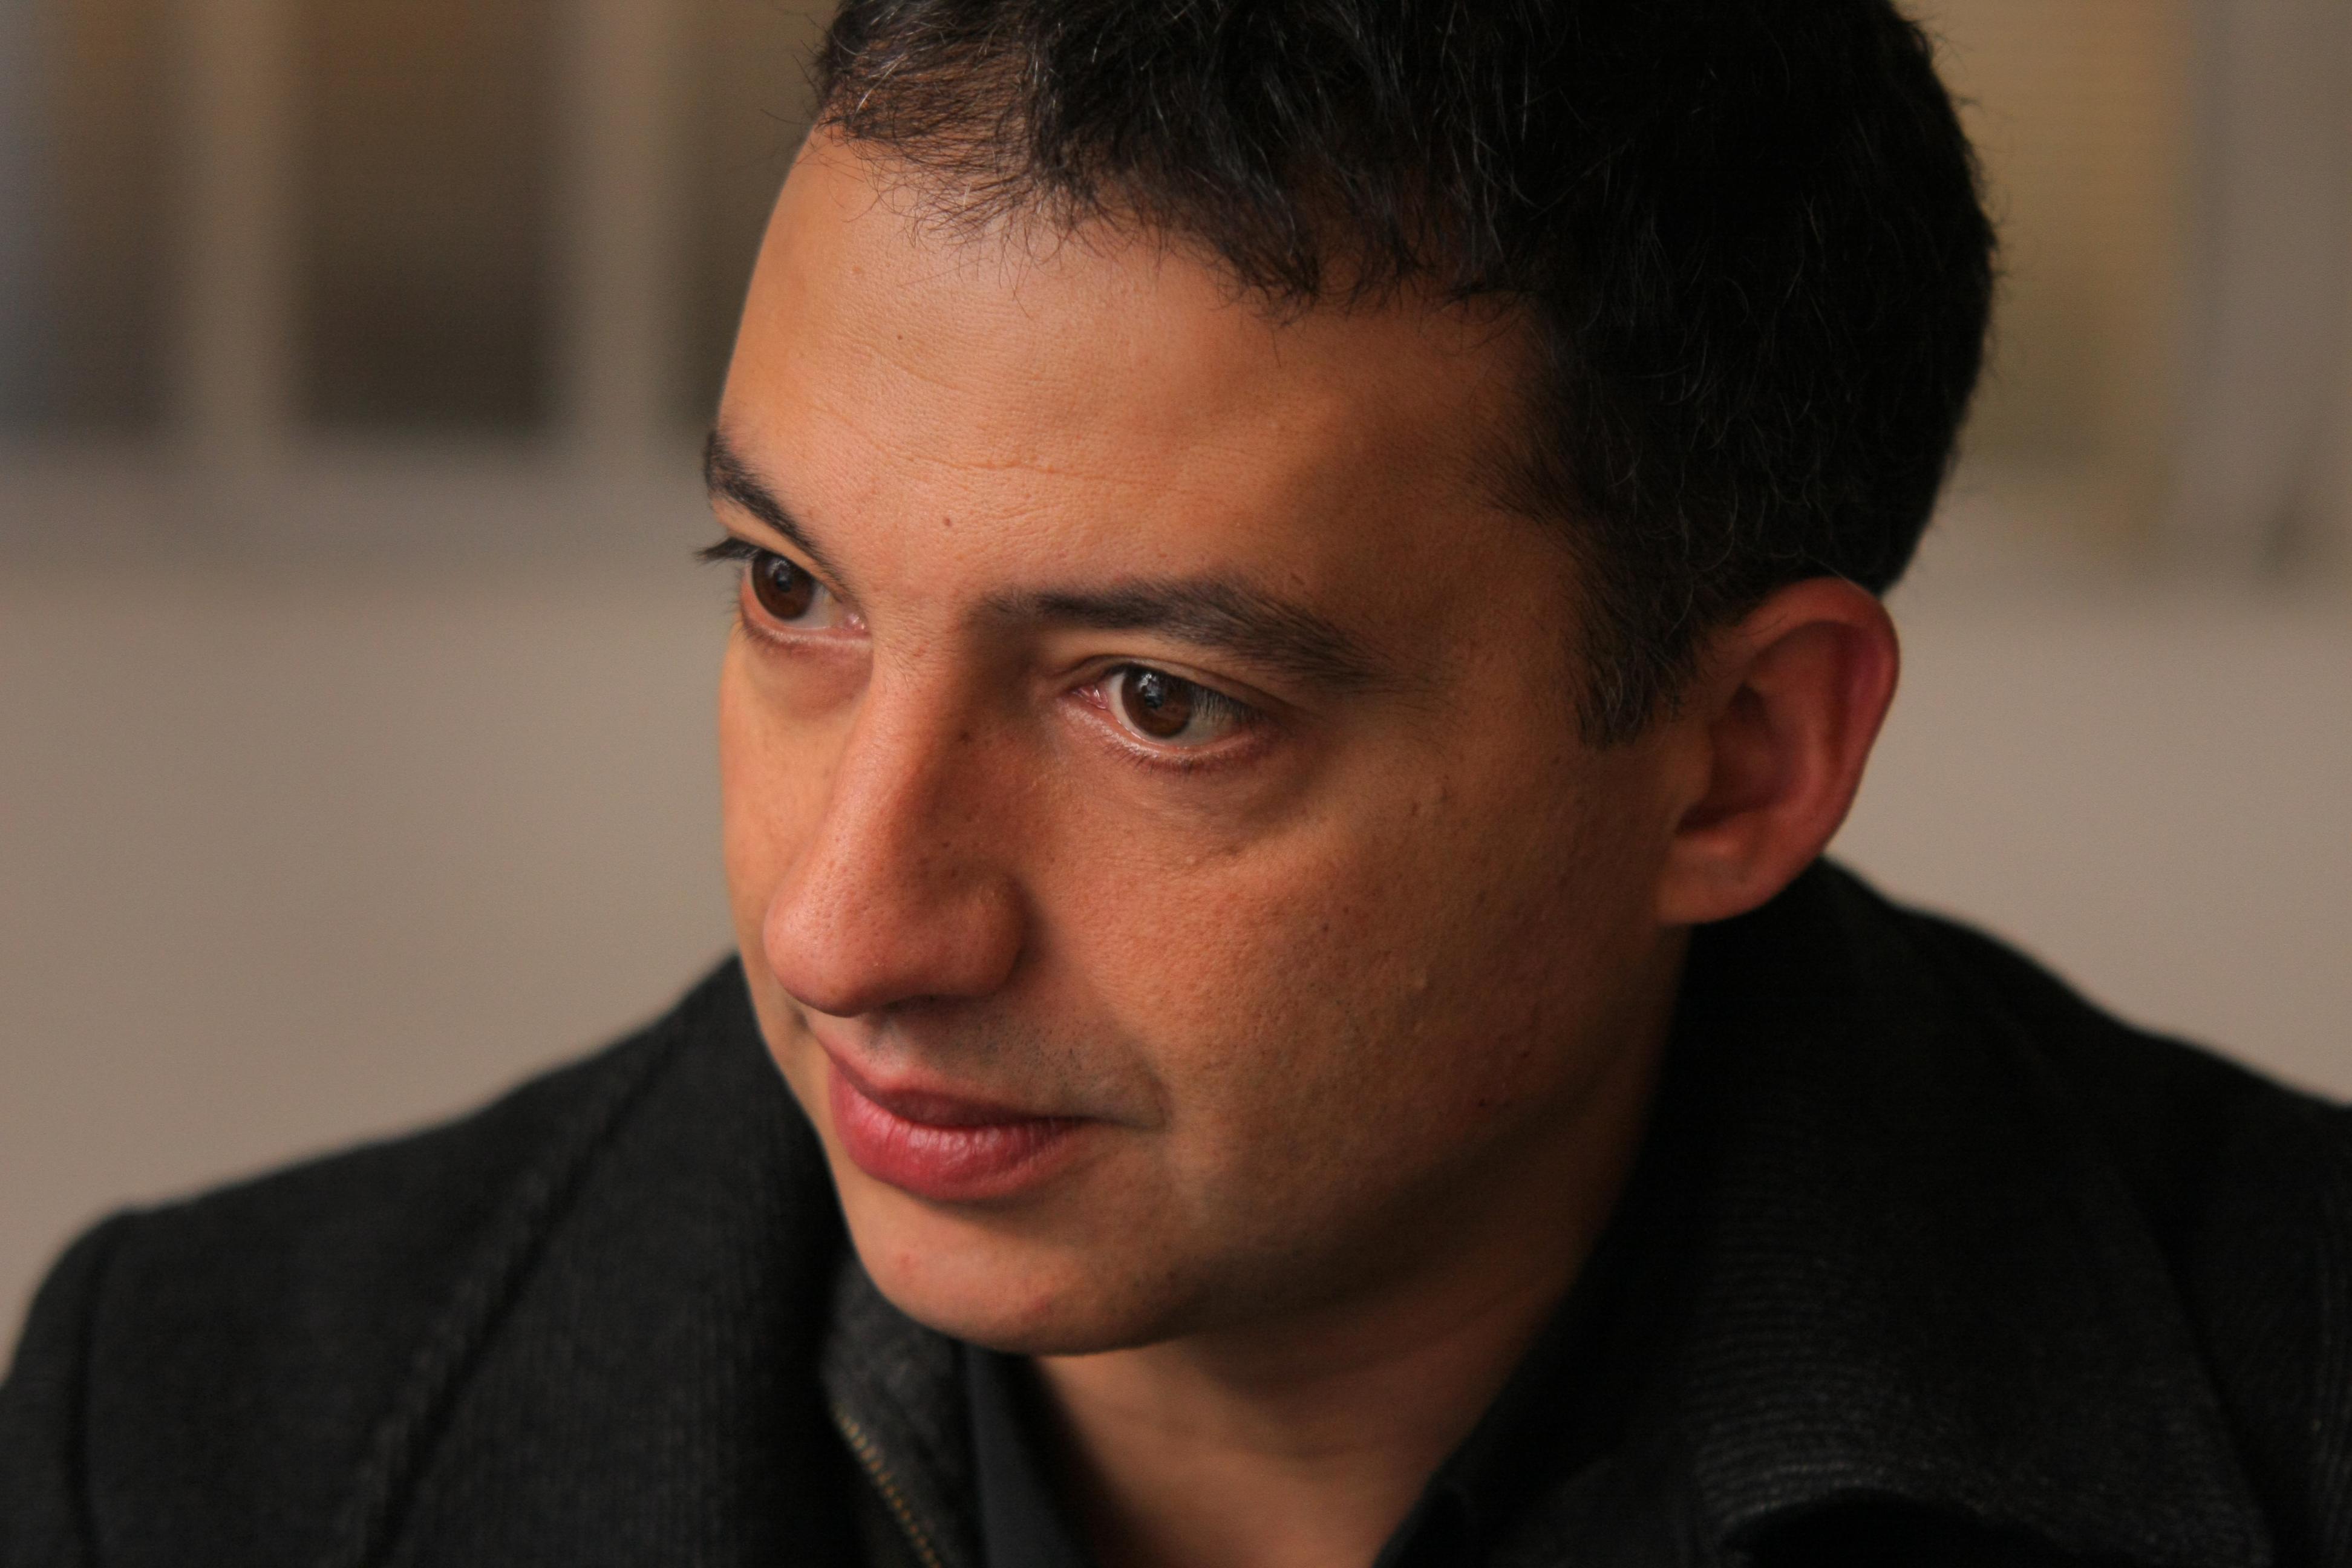 Pierre Zaoui | Vía: carnagenews